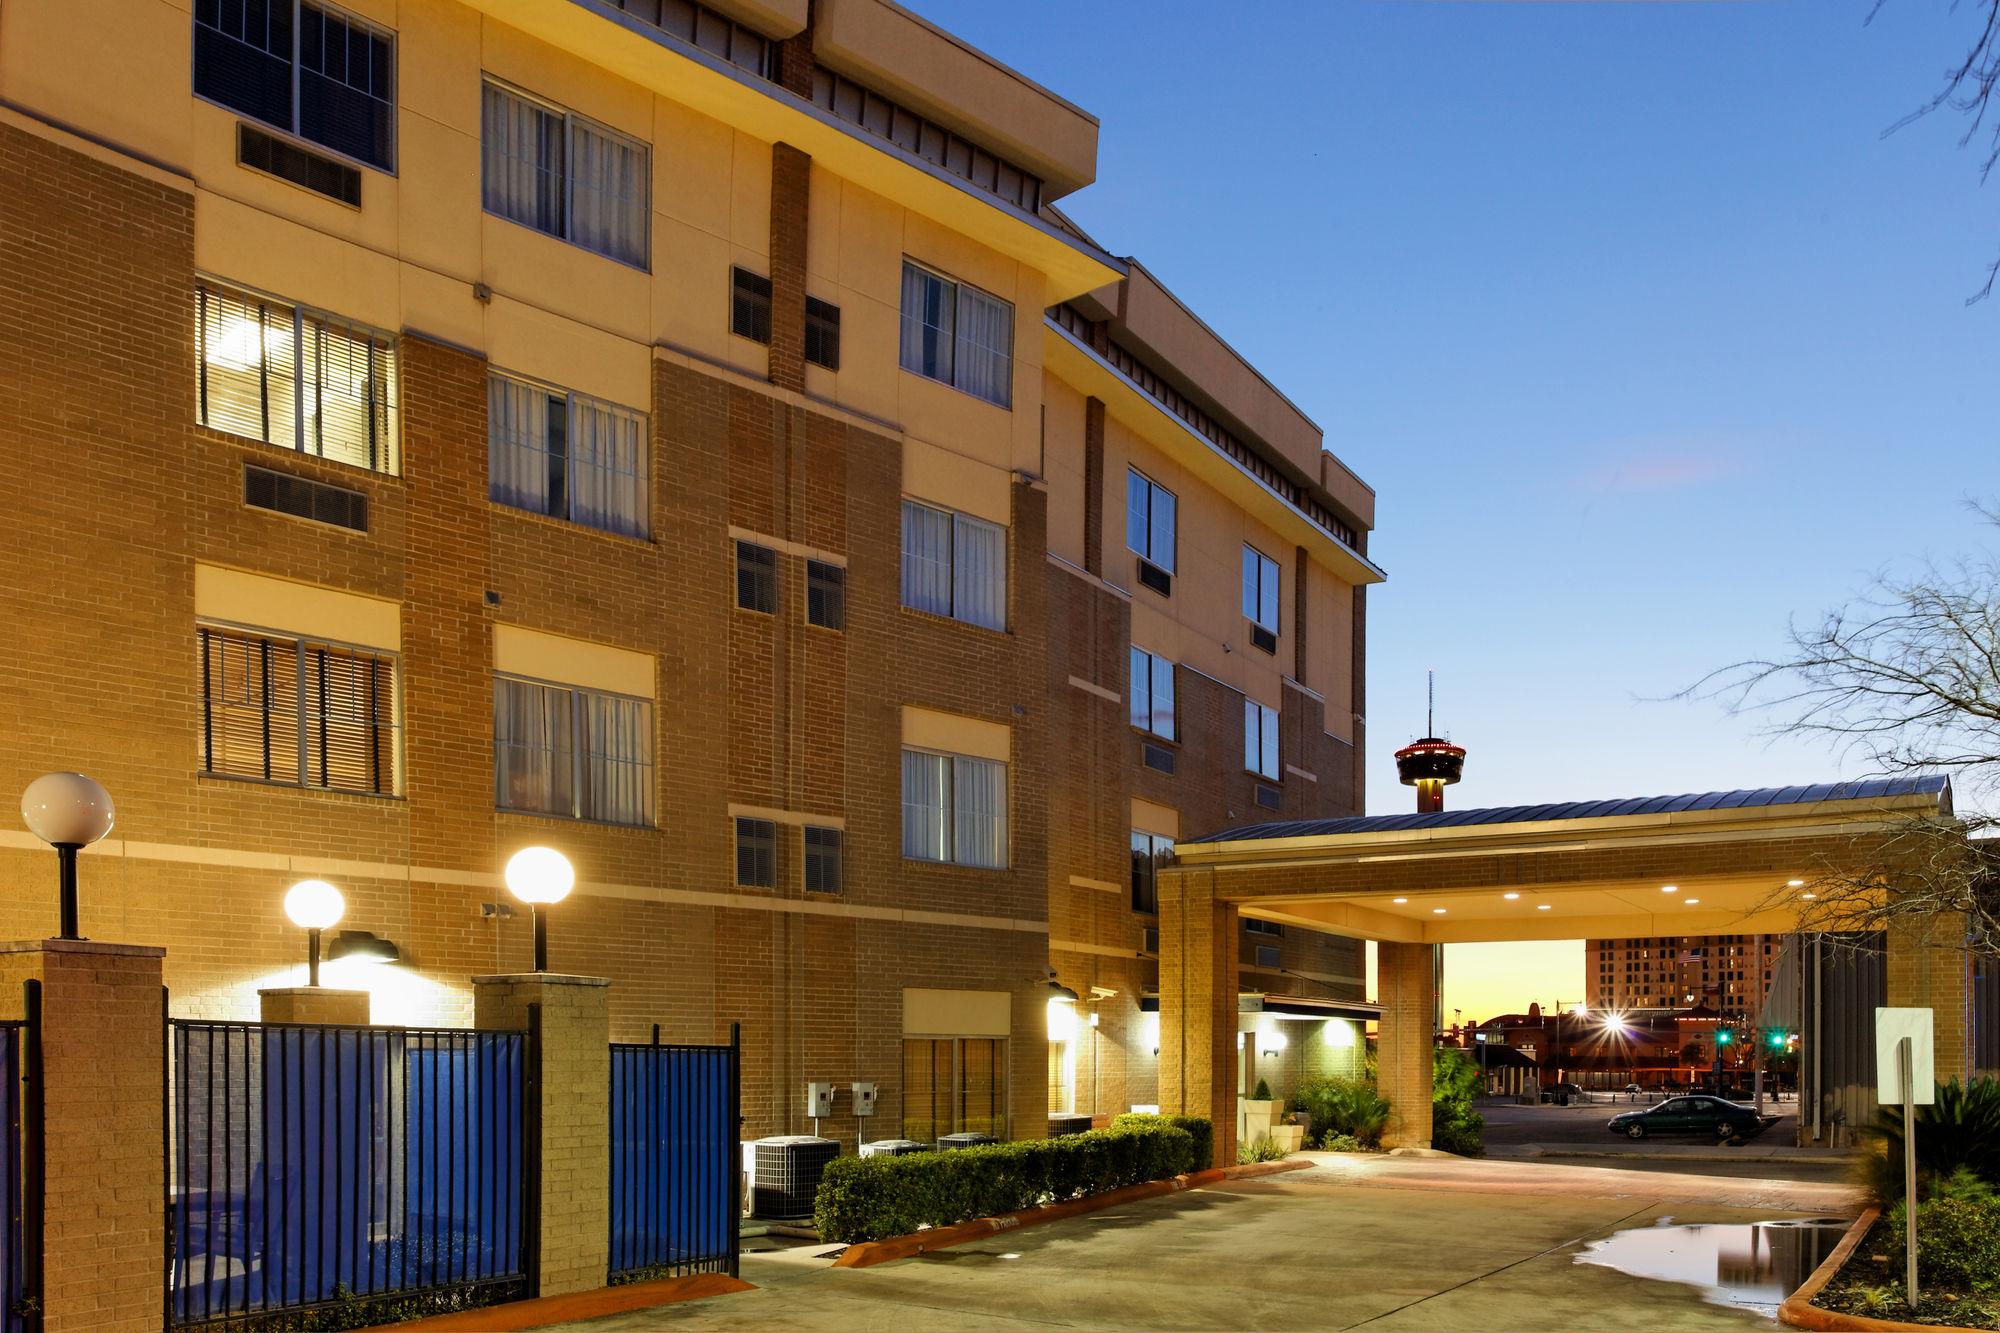 San Antonio Hotel Coupons for San Antonio, Texas - FreeHotelCoupons.com